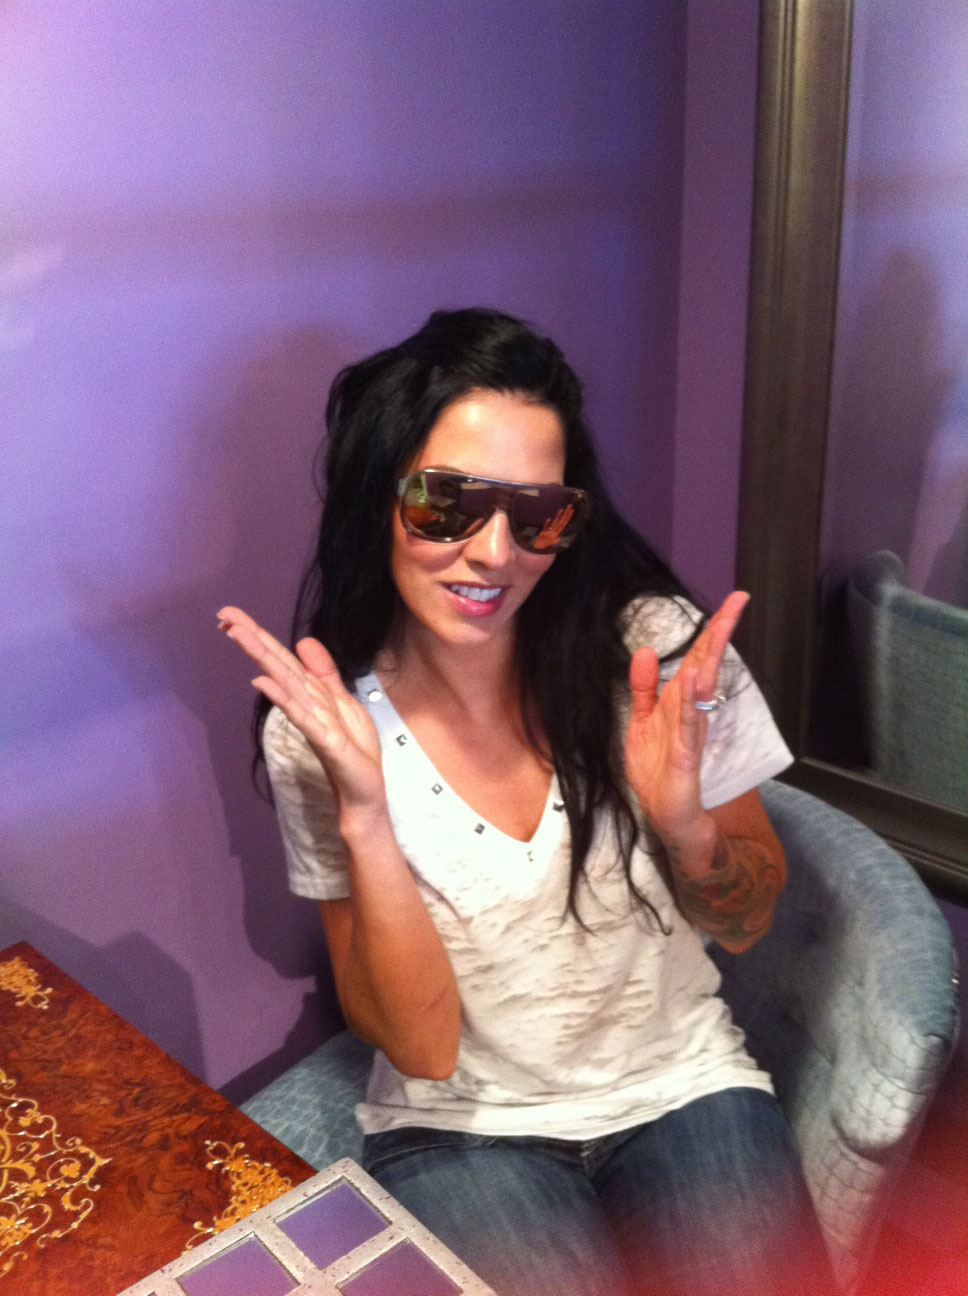 Jamie Henderson in Her New Badgley Mischka Special Edition Sunglasses